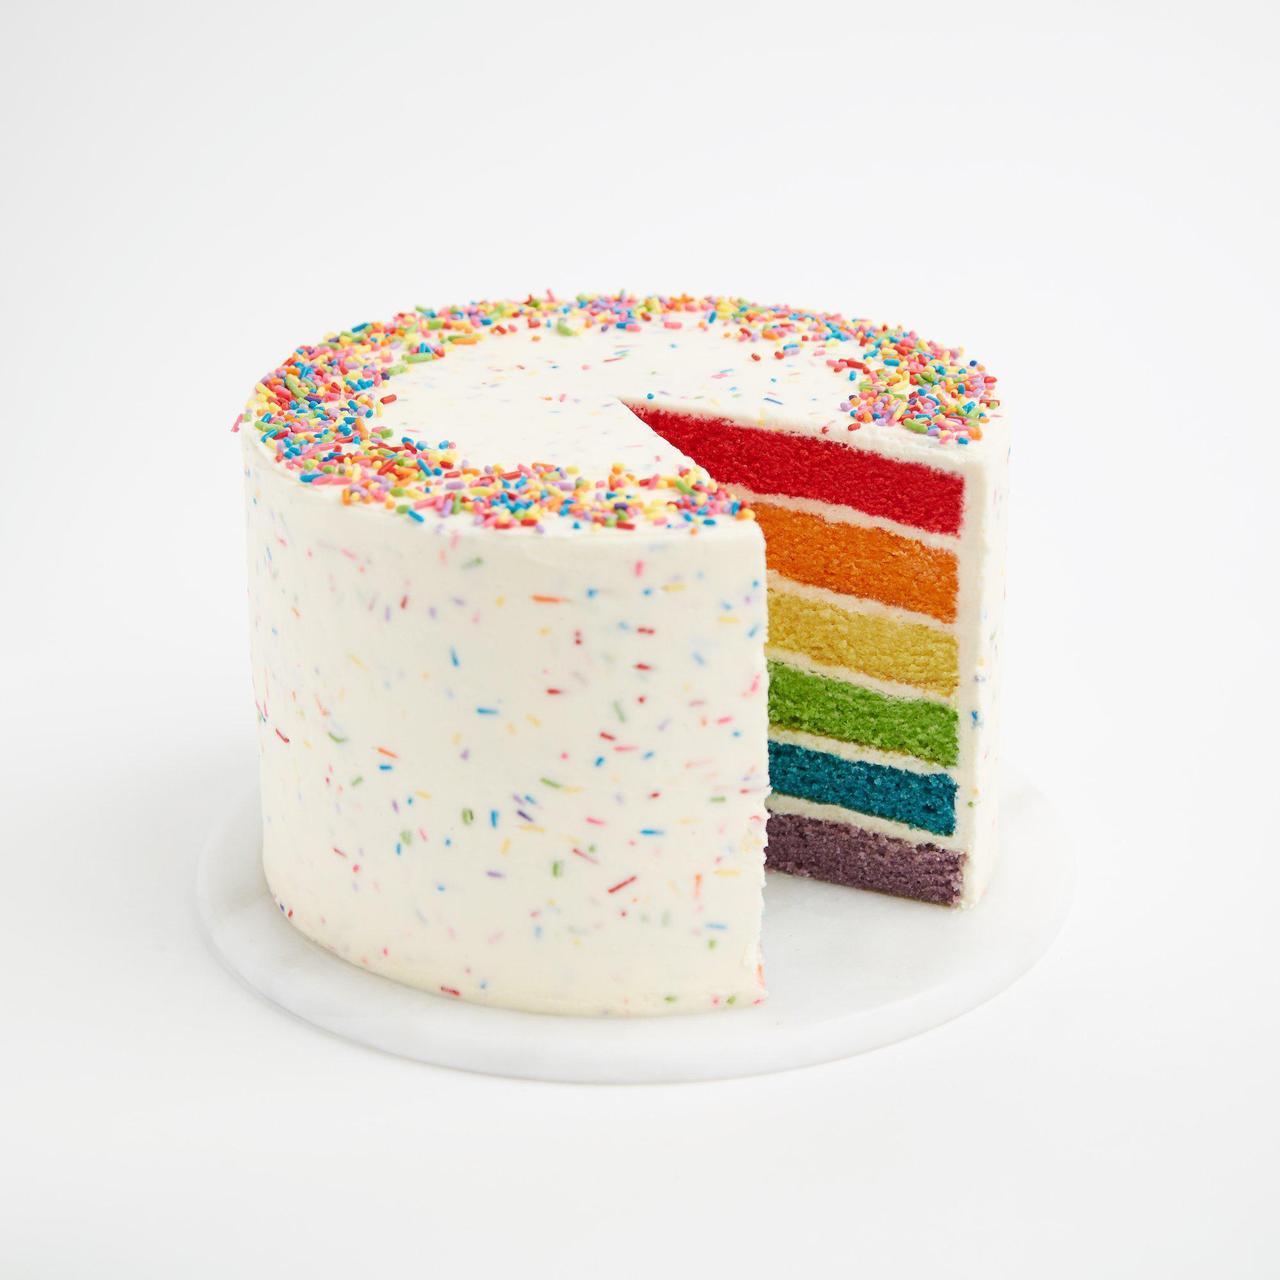 Astonishing Buy Rainbow Cake Online Best Rainbow Cake Online Delivery Funny Birthday Cards Online Alyptdamsfinfo